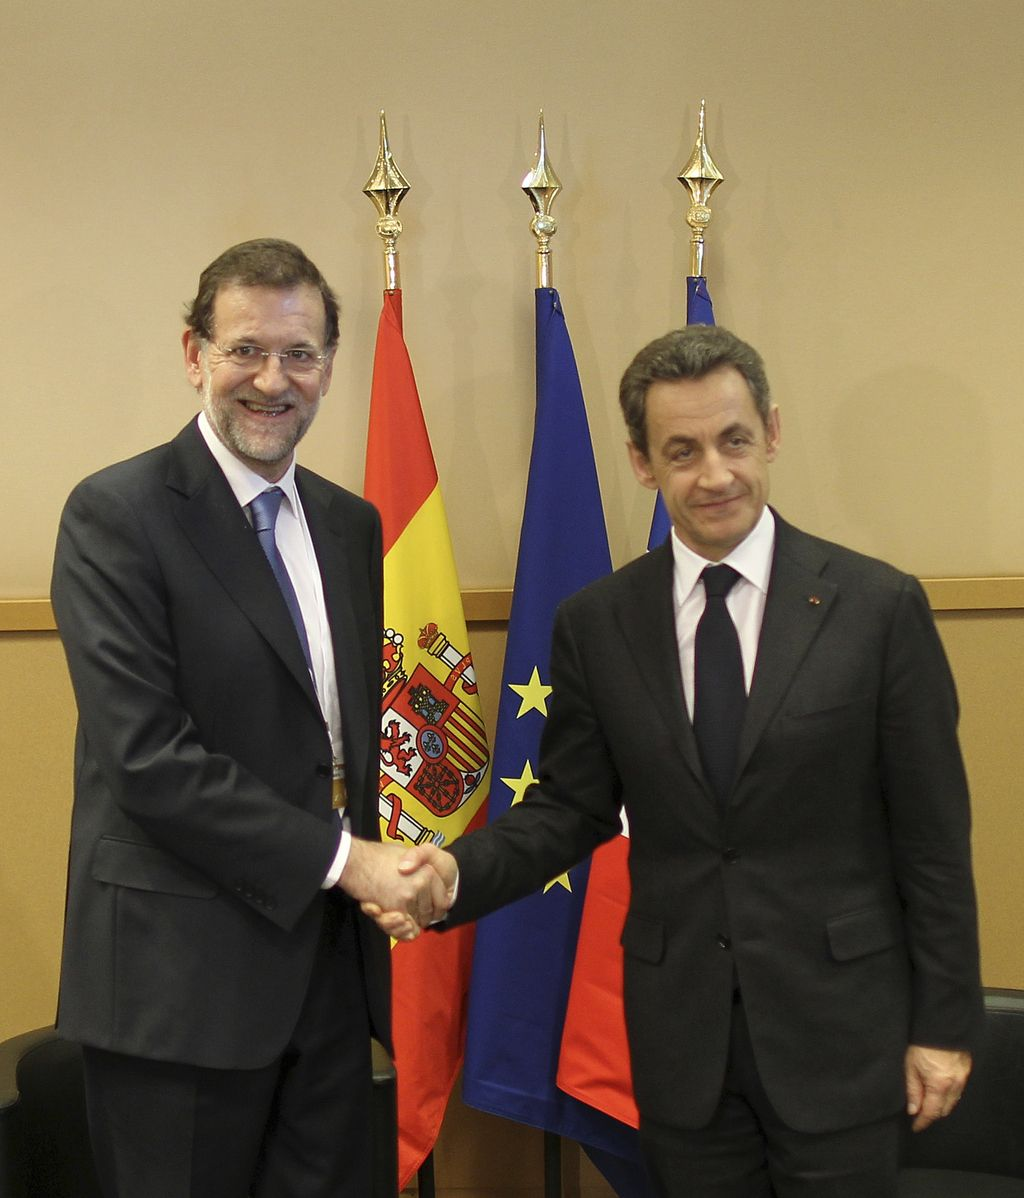 Mariano Rajoy recibirá en Moncloa al presidente galo